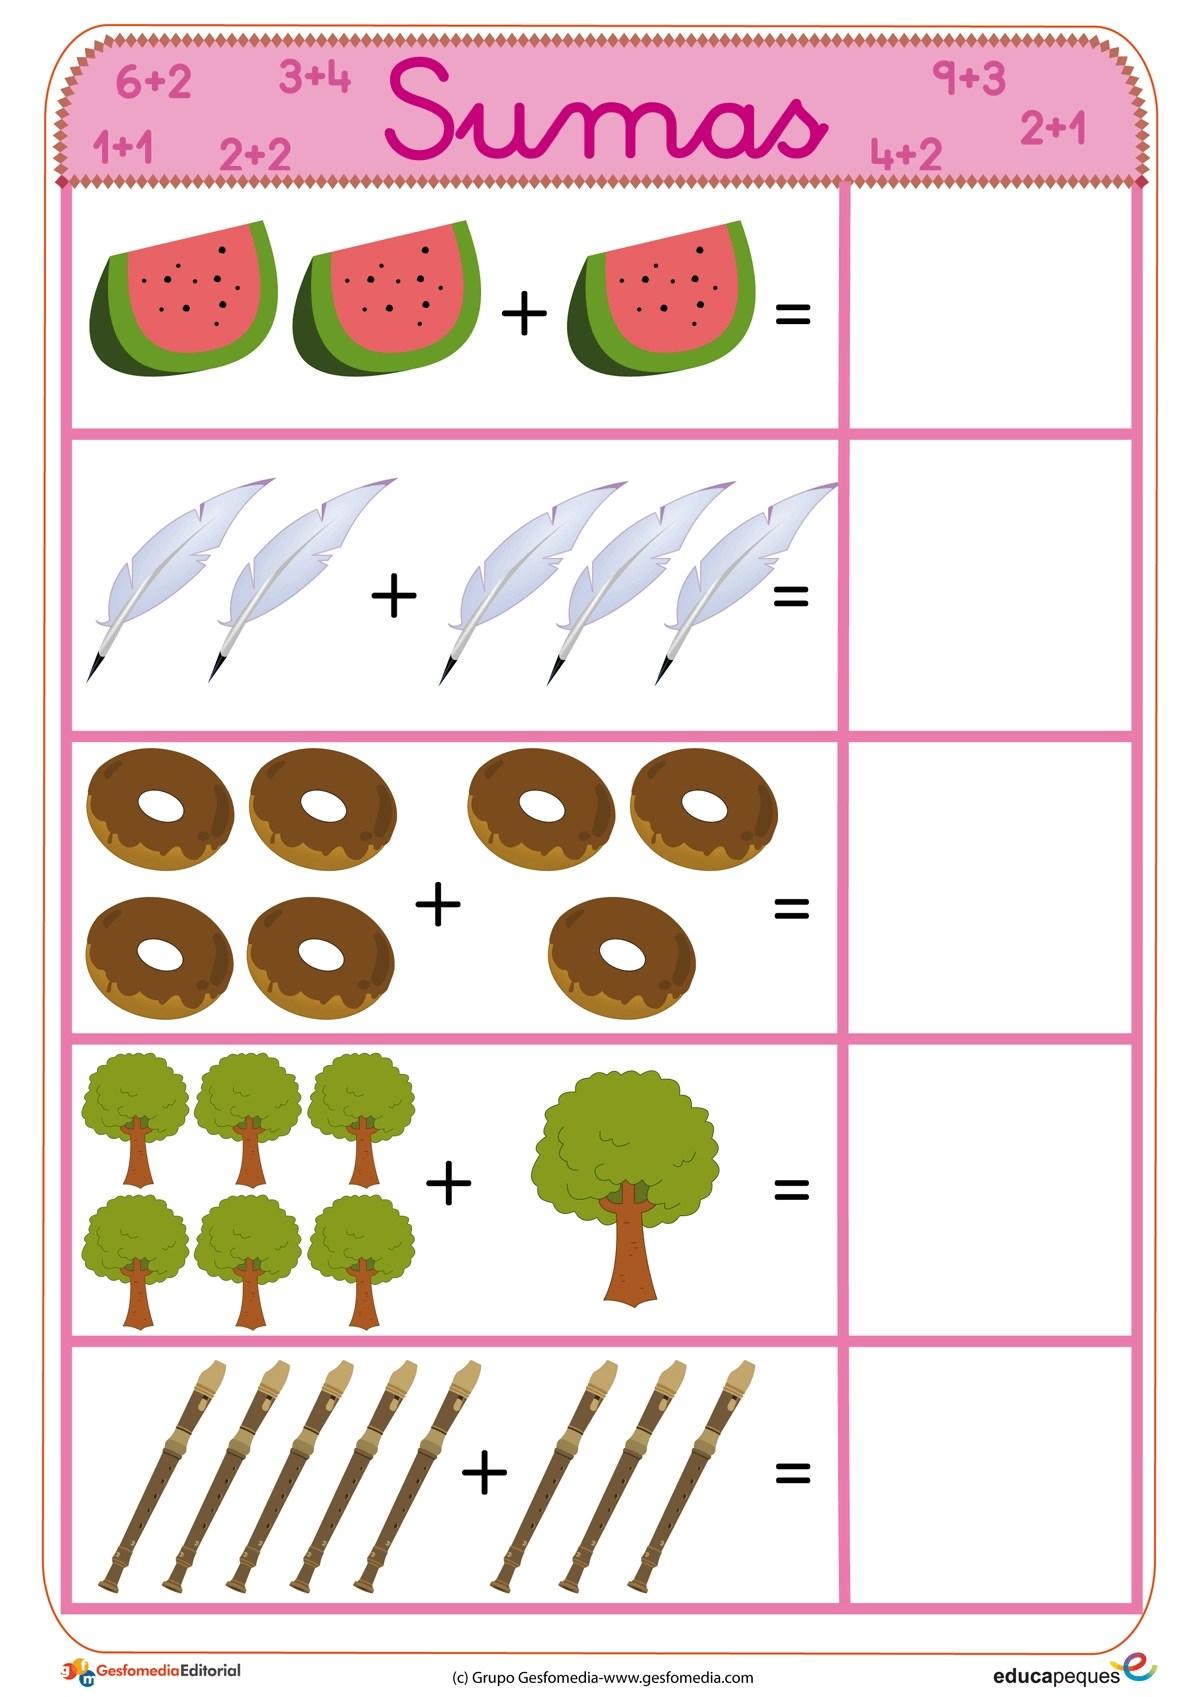 Belajar Anak Paud Kelas 1 Sd Matematika Penjumlahan